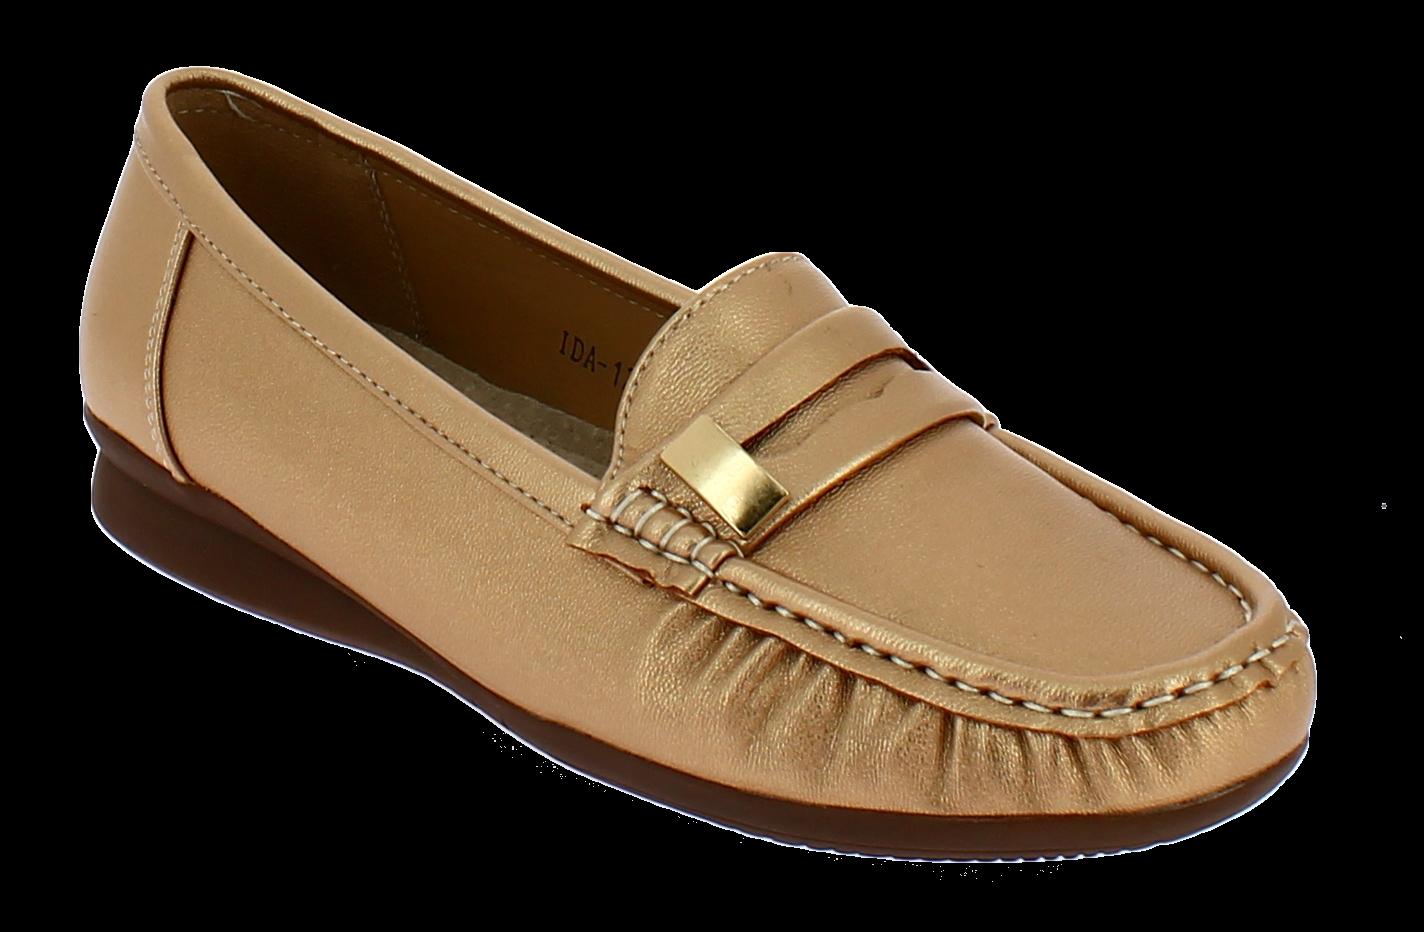 ANTRIN Γυναικείο Comfort IDA-120 Χρυσό - IqShoes - IDA-120 GOLD-ANTRIN-gold-37/1 προϊόντα παπούτσια